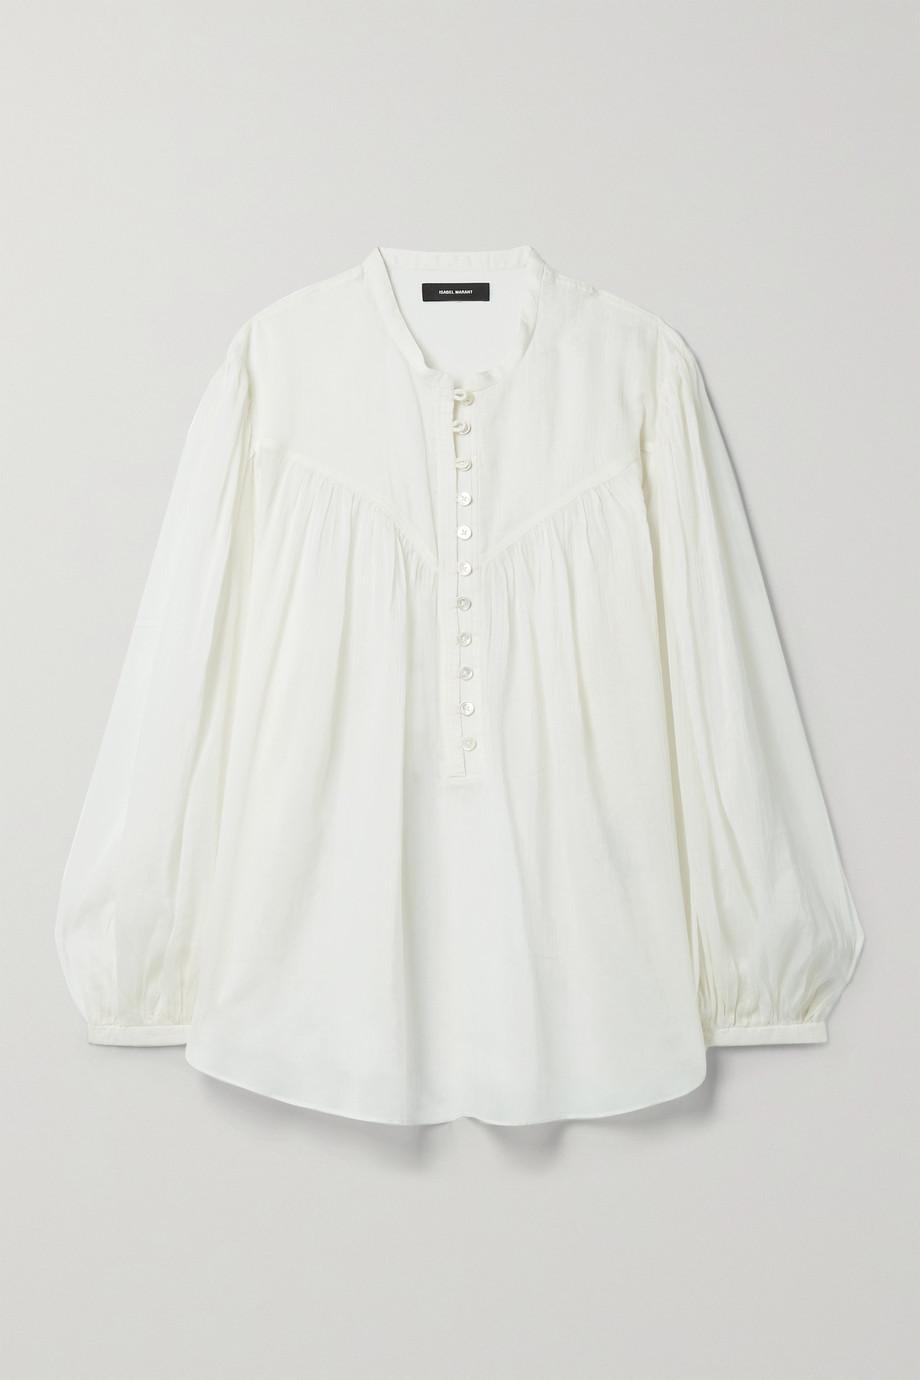 Isabel Marant Kiledia cotton and silk-blend crepon blouse